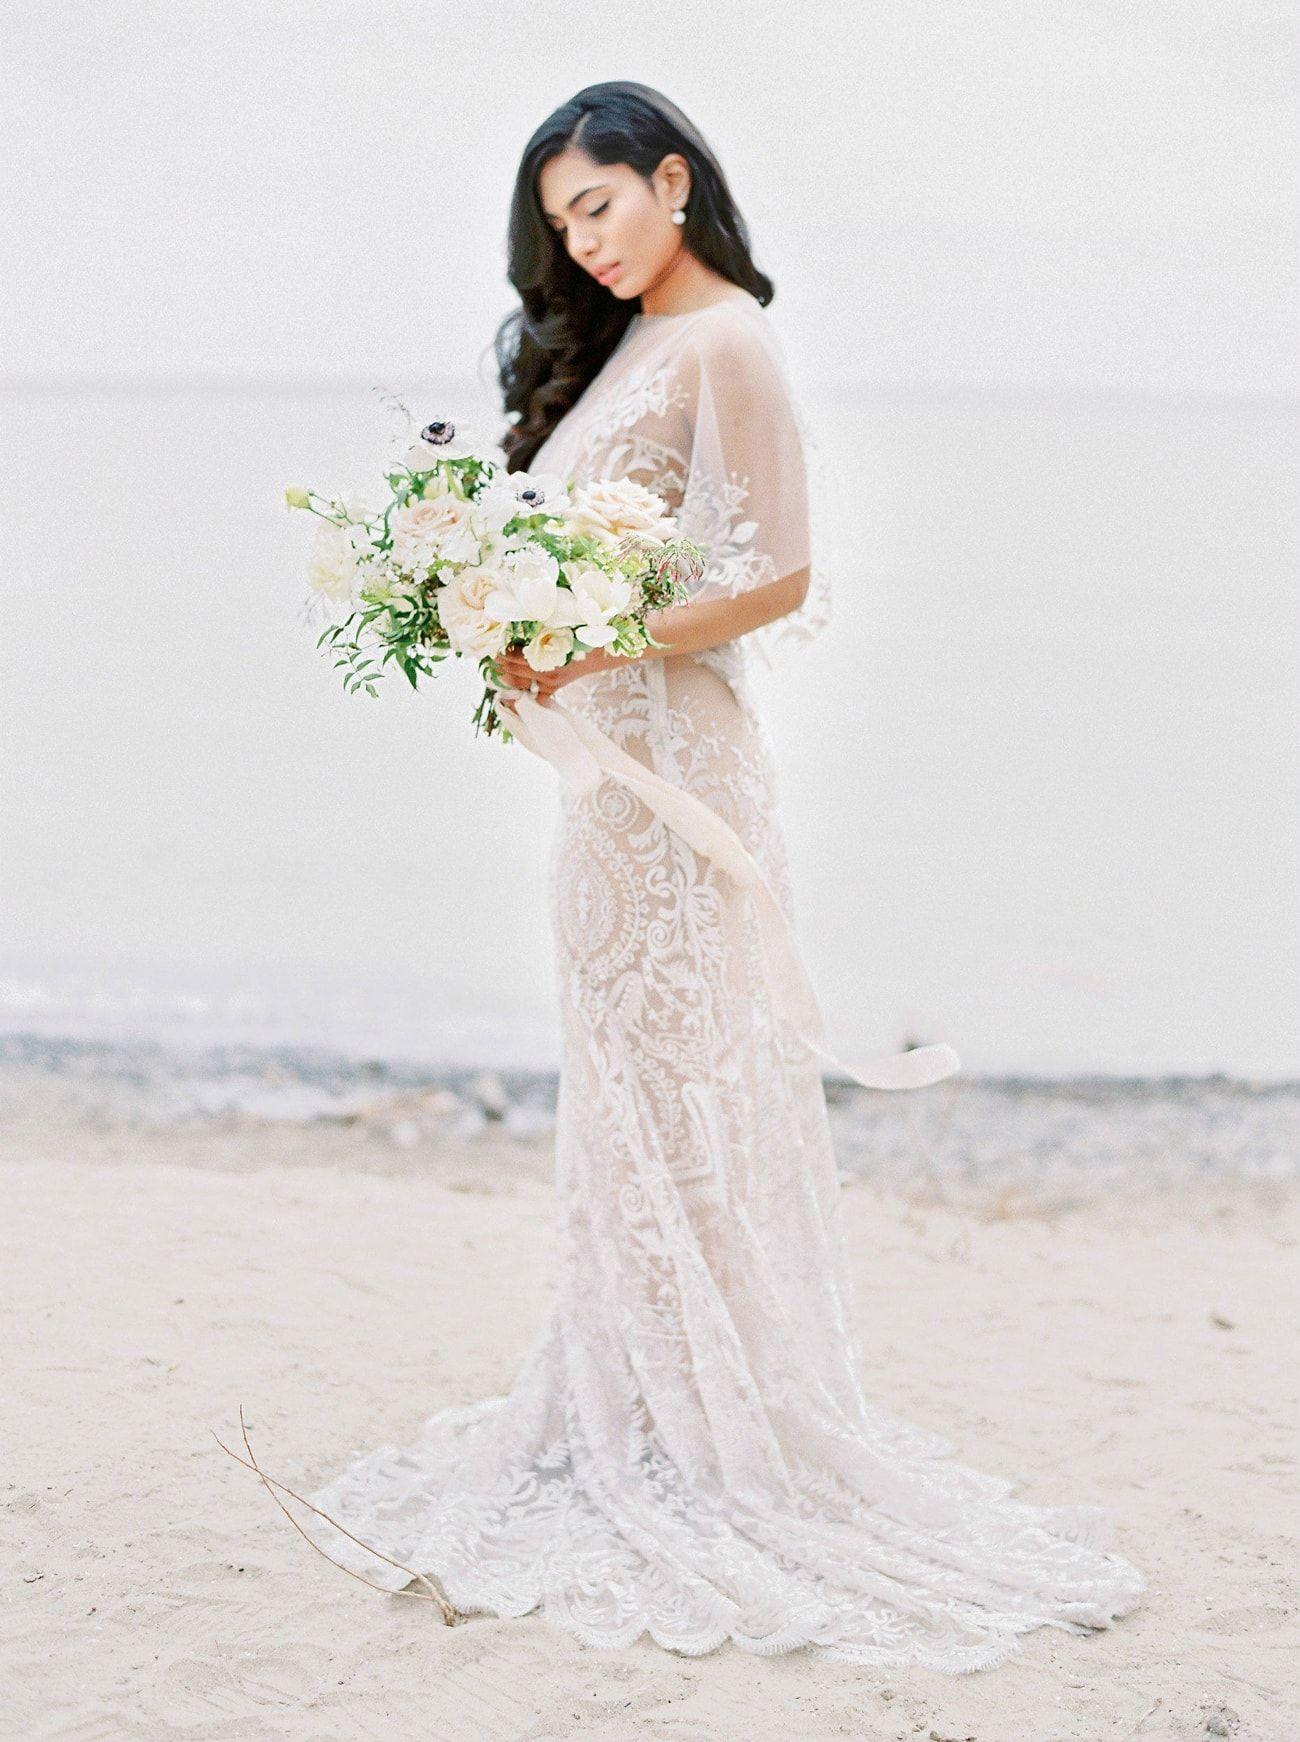 Sheer wedding dress   Chic u Sheer Wedding Dresses from Etsy  SouthBound Bride  Dream